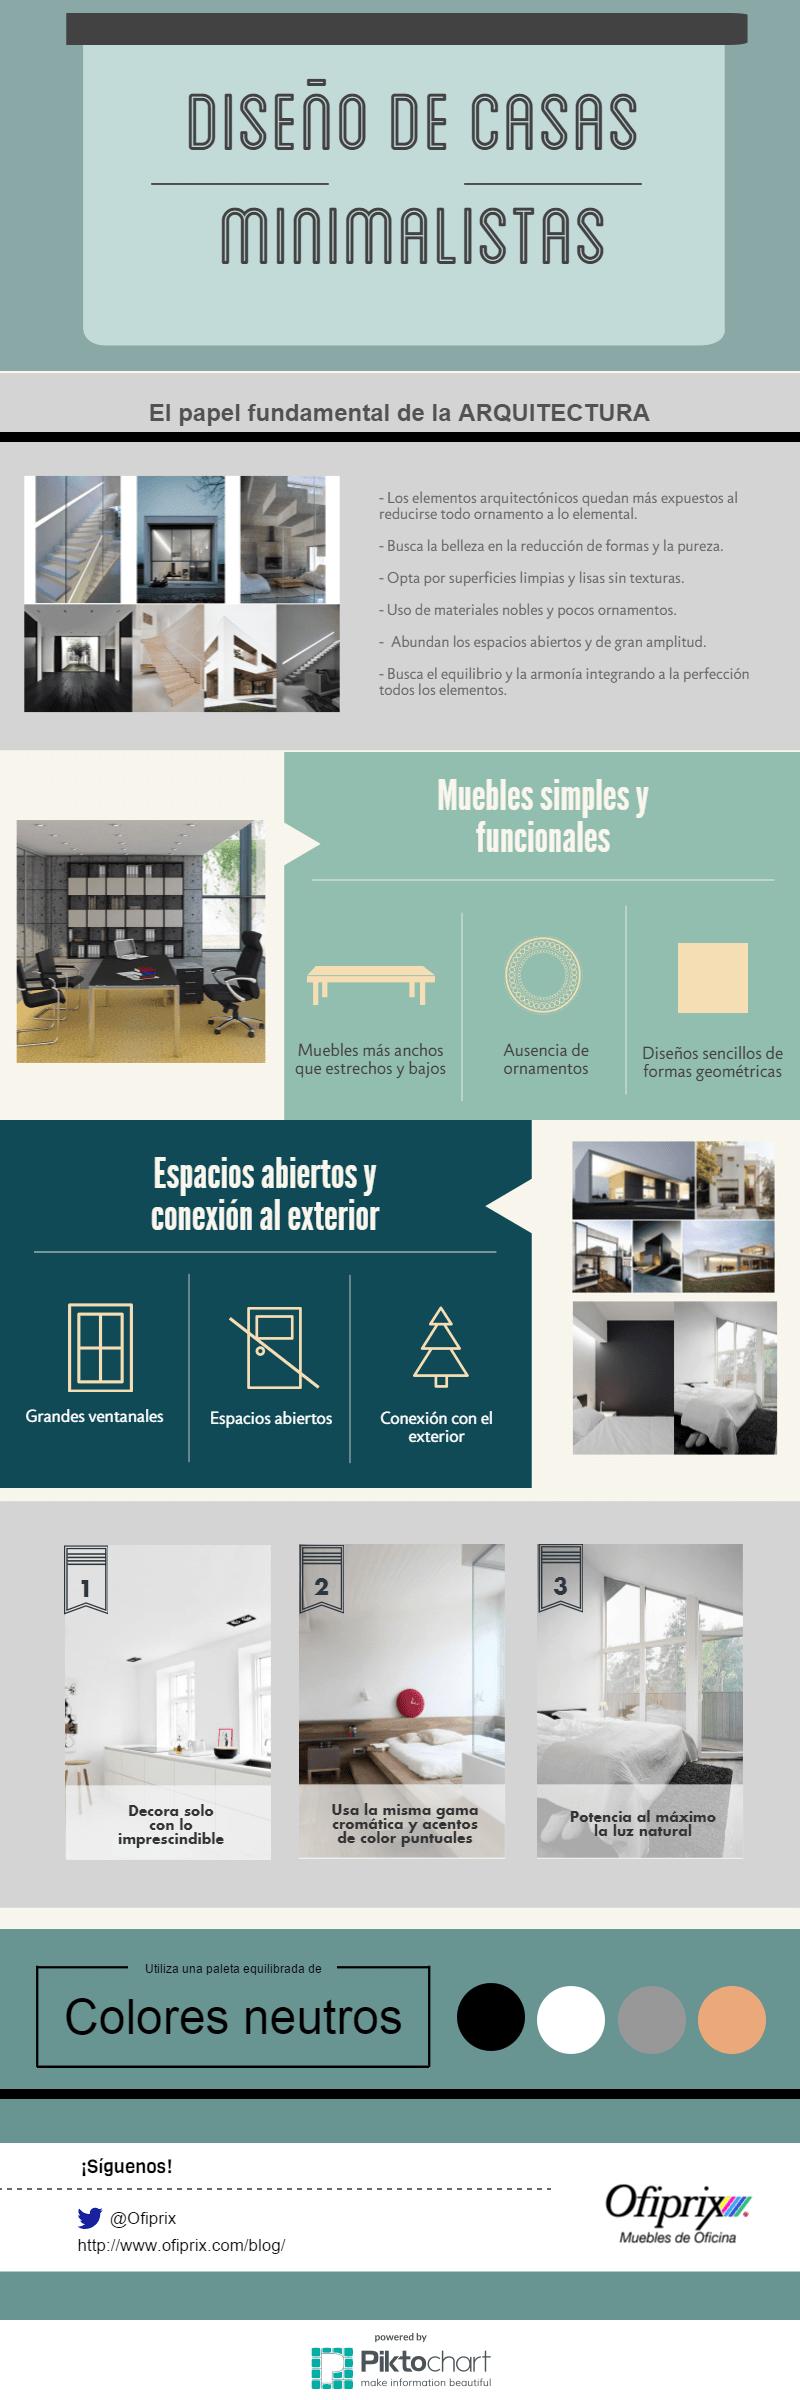 infografia deco minimalista